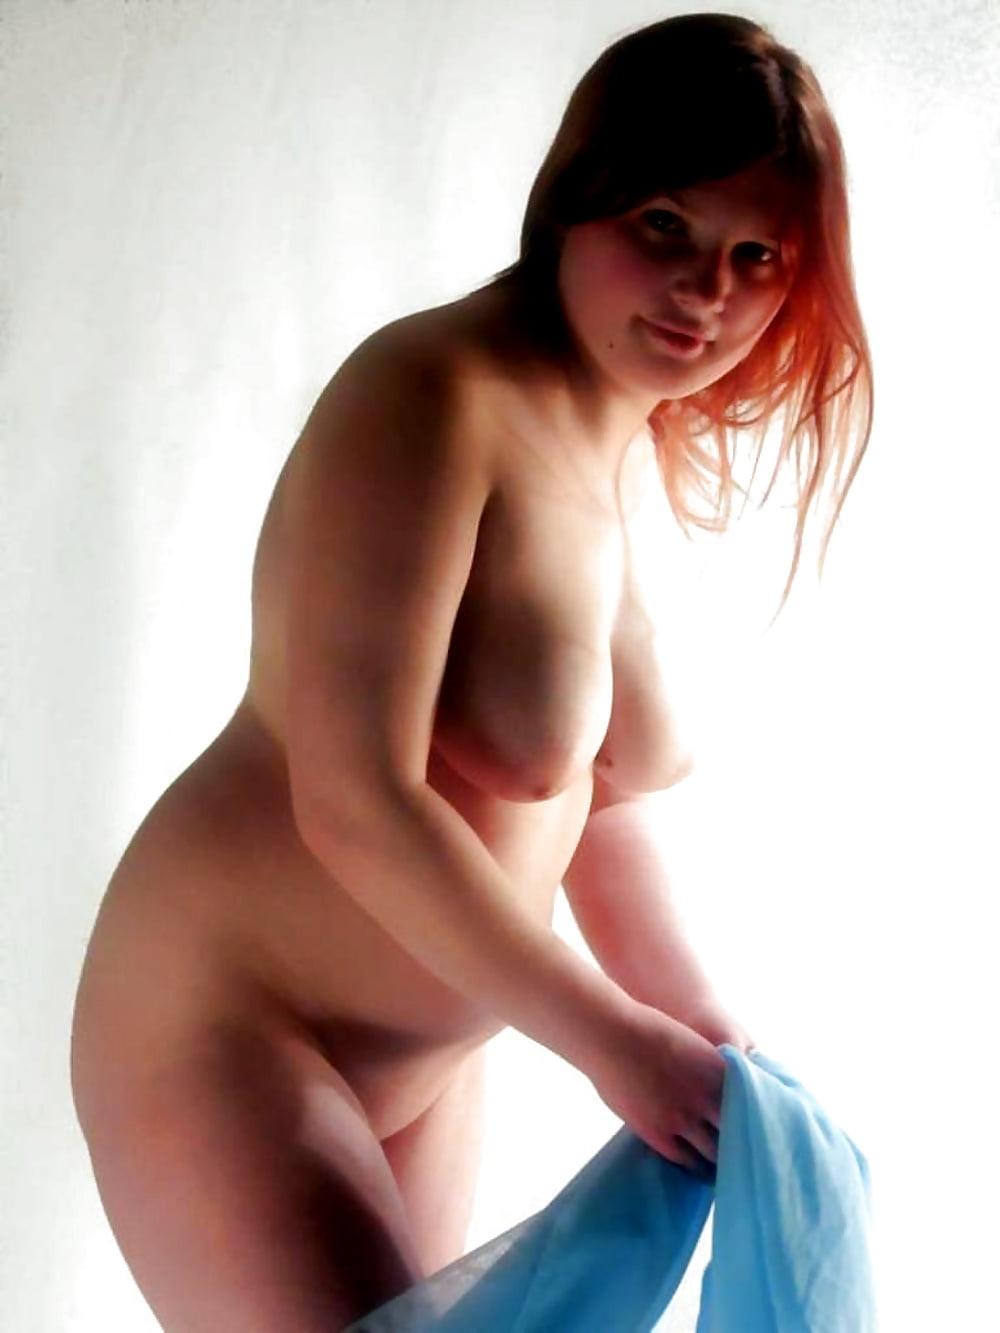 Purzelpics true beauty reserl chubby cutie nude gallery